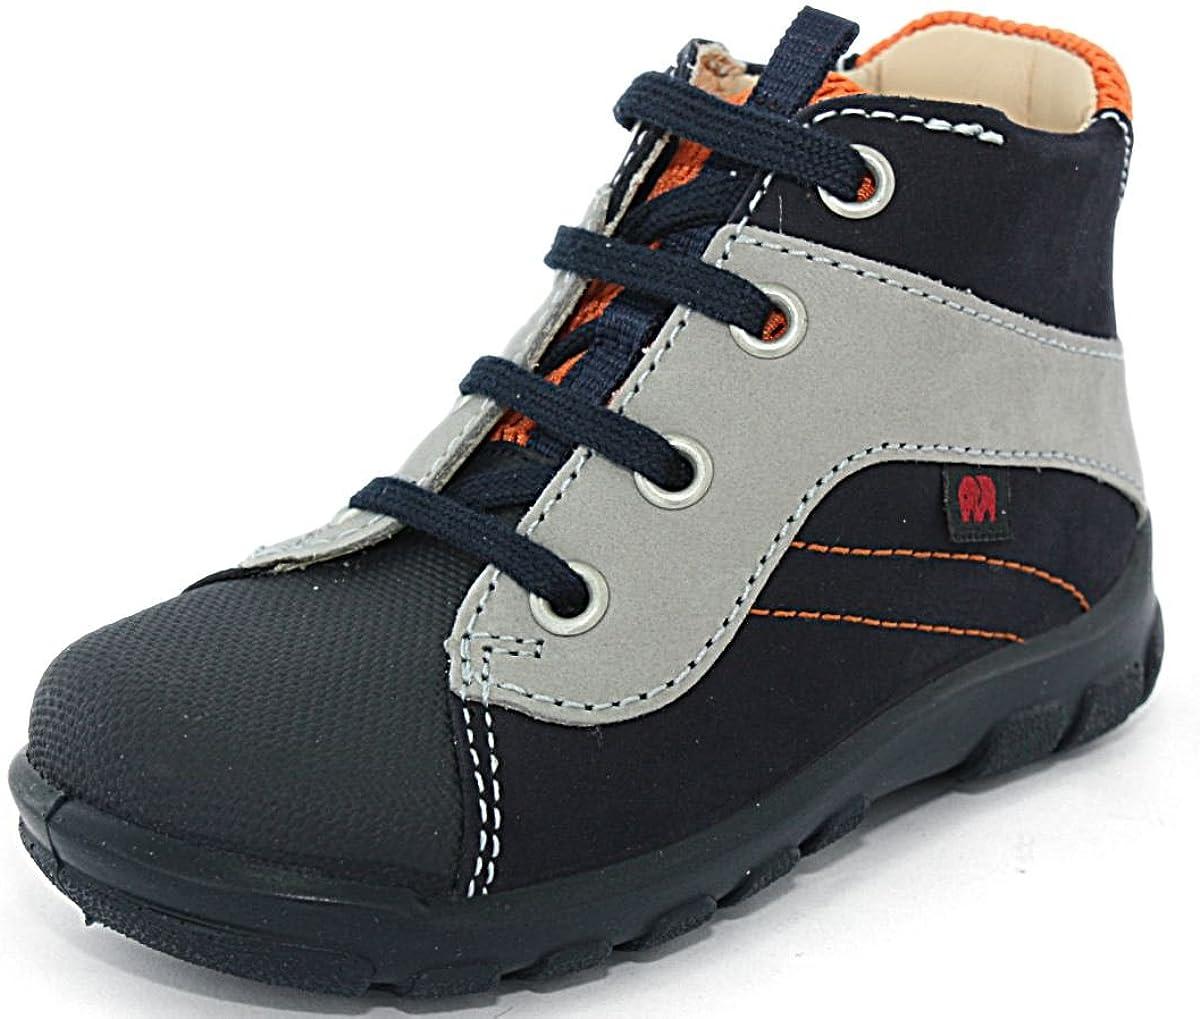 Elefanten Boys First Walking Shoes Size 6 5 Amazon Co Uk Shoes Bags